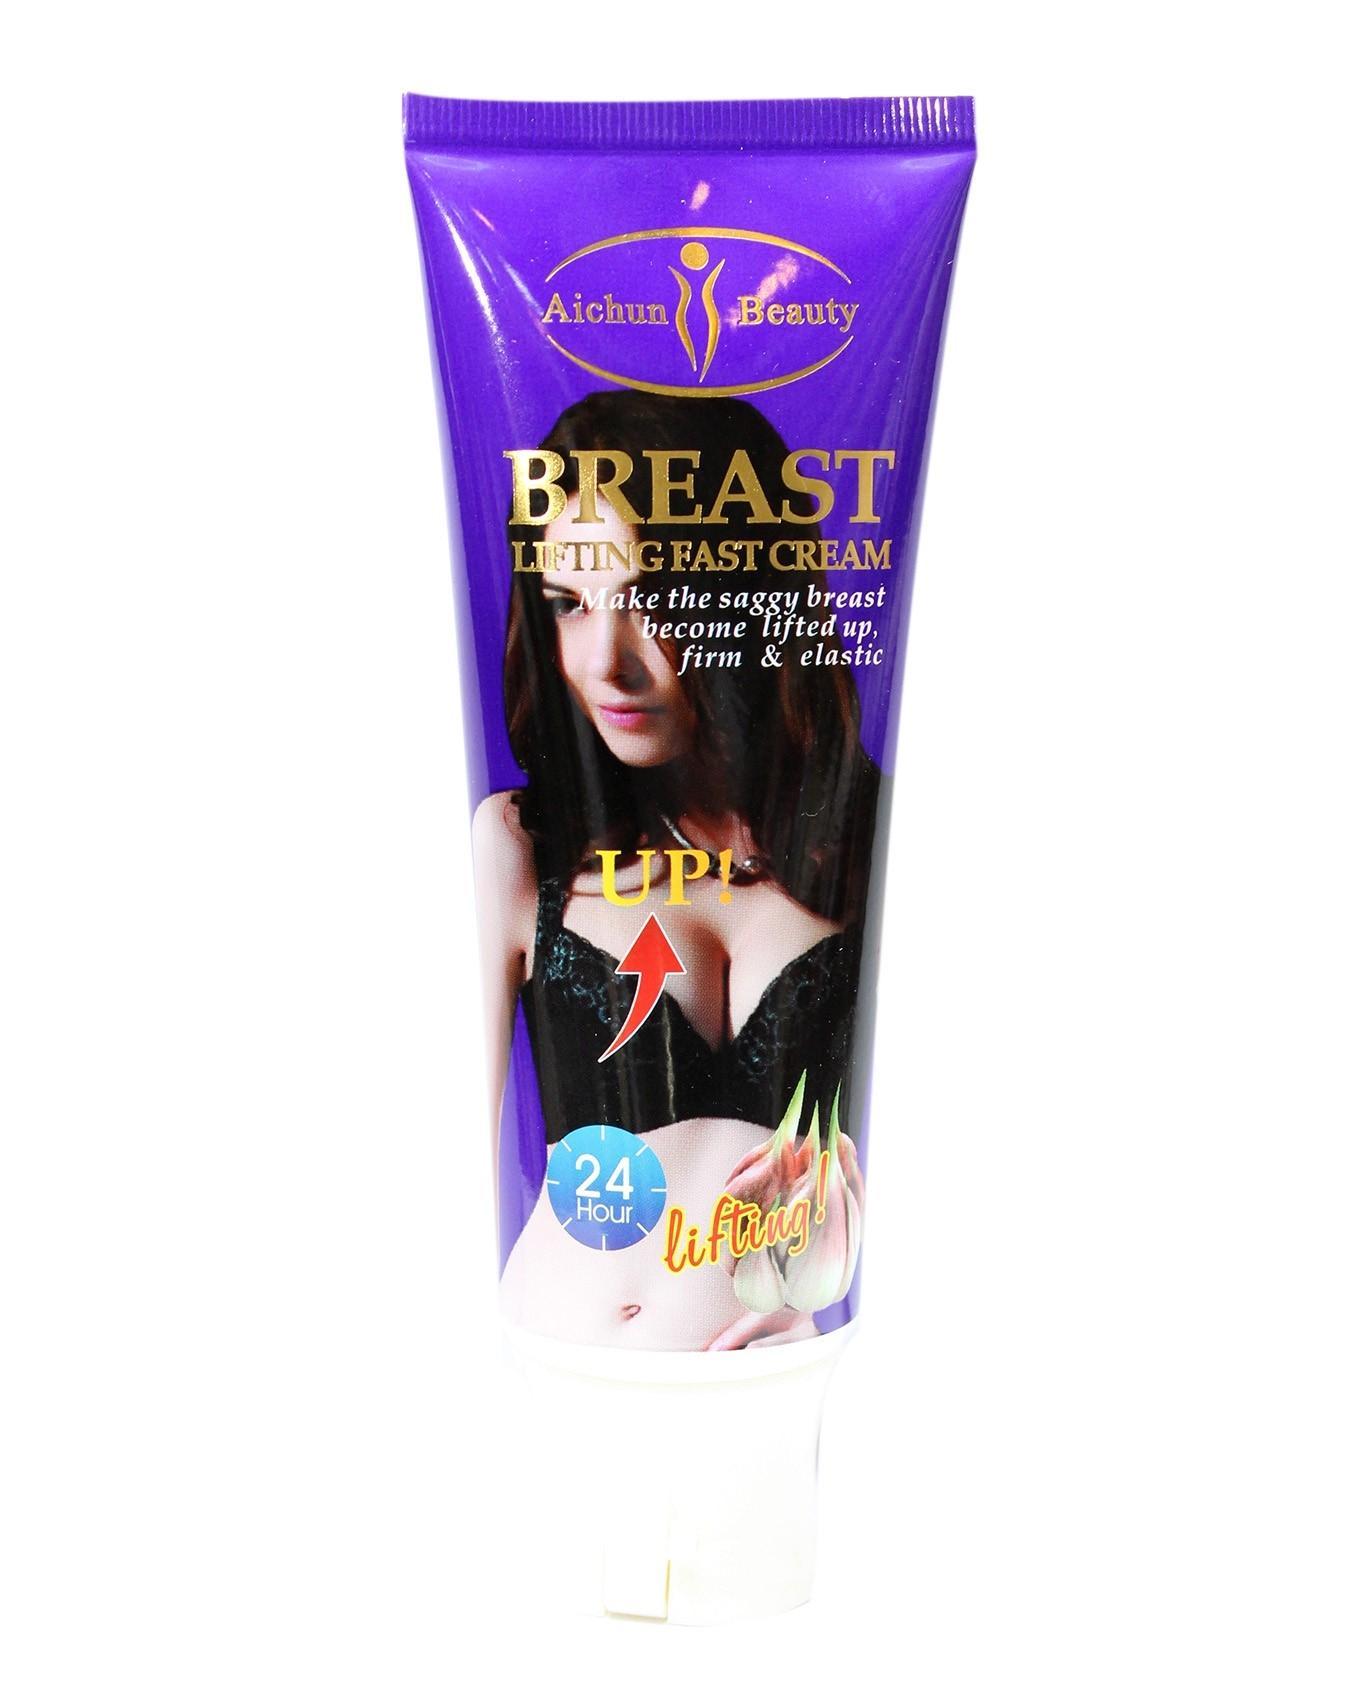 Breast Lifting Fast Cream Garlic Extract 120g